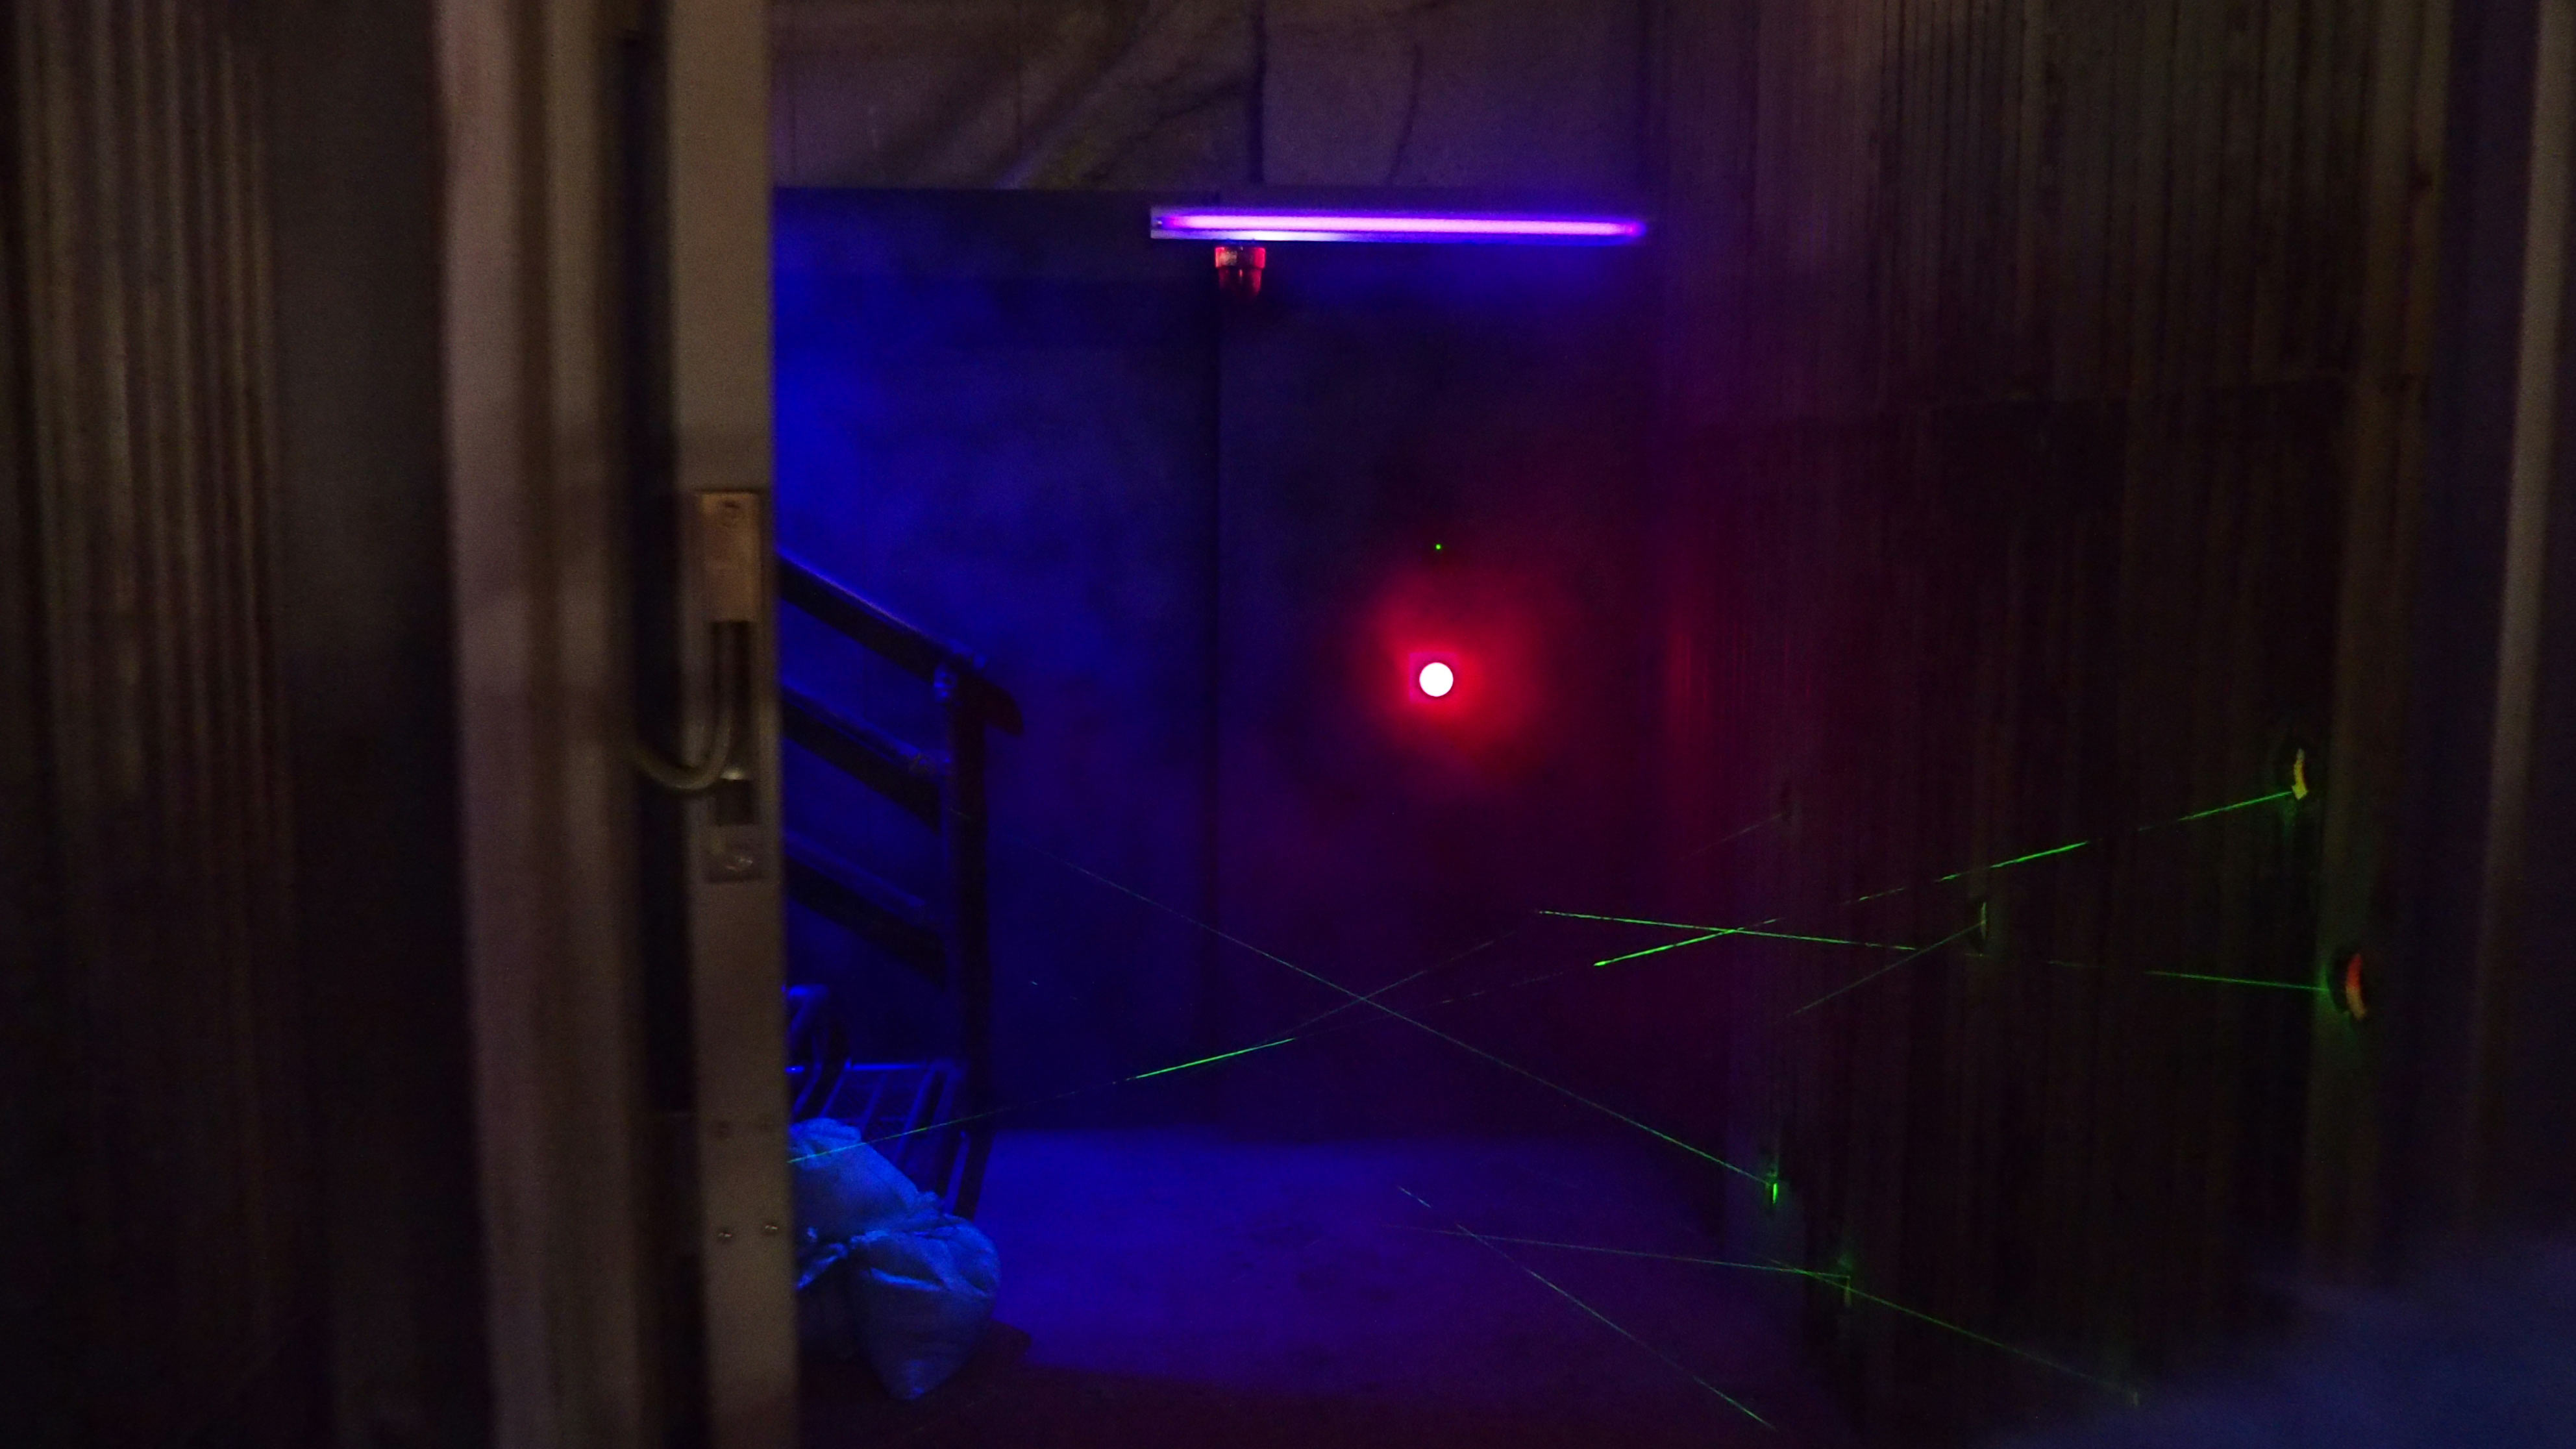 inSPYre(インスパイア)のフロア内にあるレーザー部屋